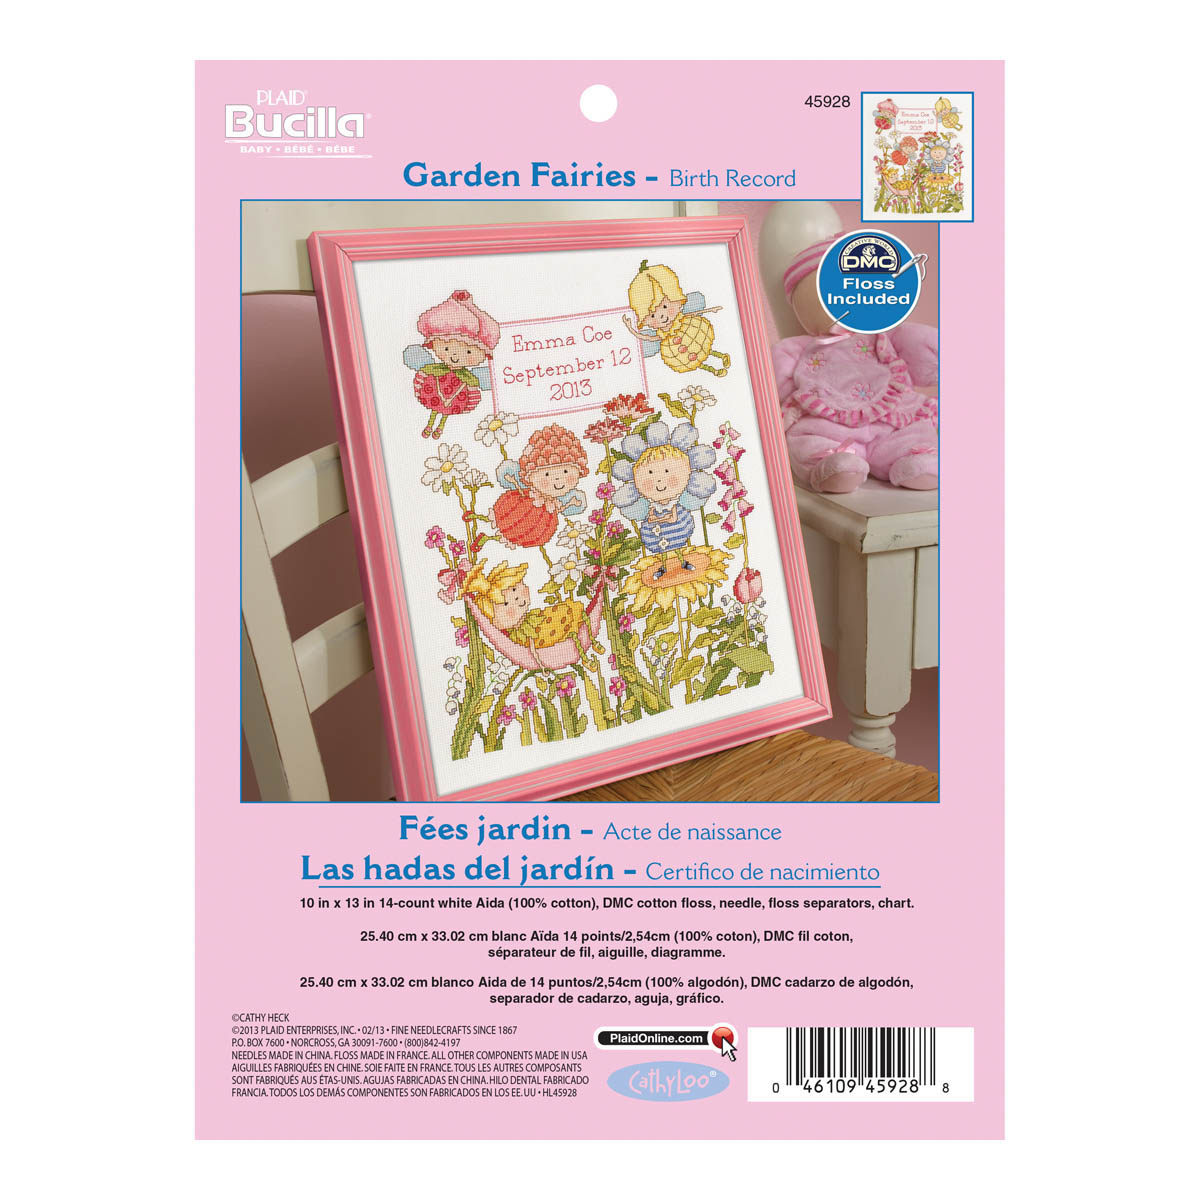 Bucilla ® Baby - Counted Cross Stitch - Crib Ensembles - Garden Fairies - Birth Record Kit